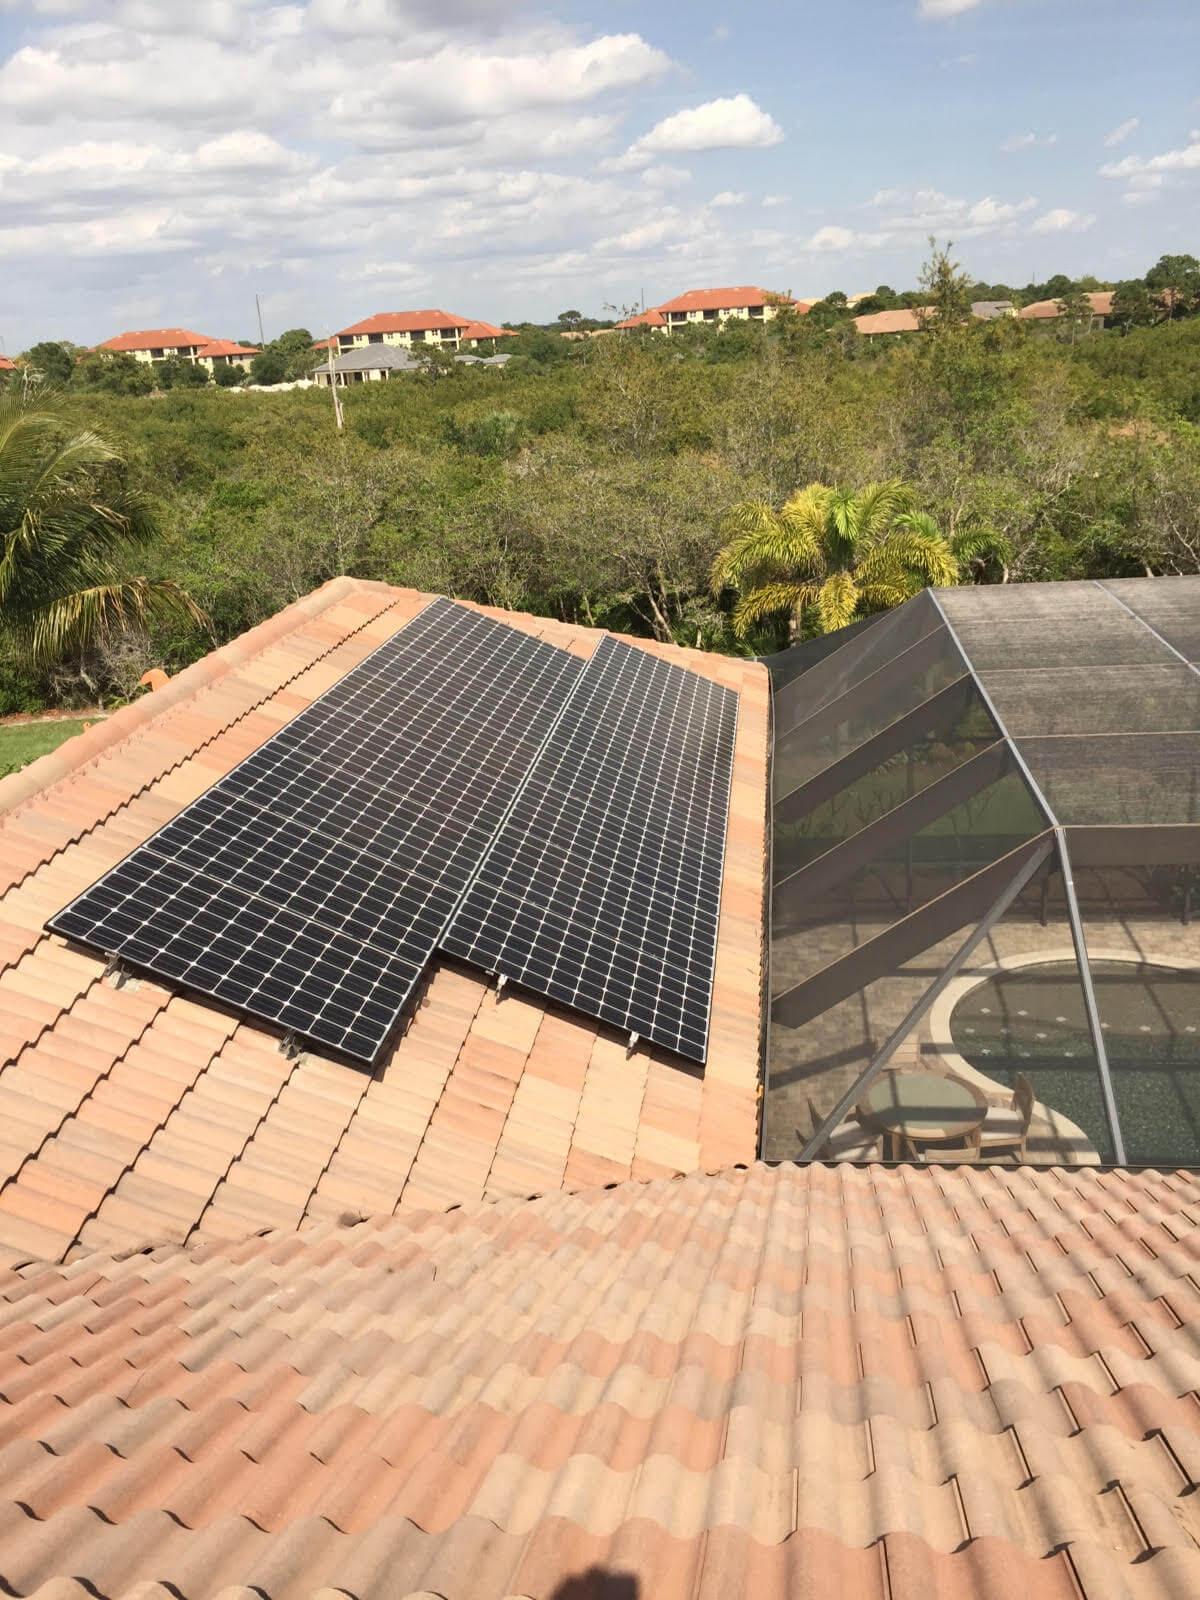 Estero, FL Solar Photovoltaic System on Tile Roof